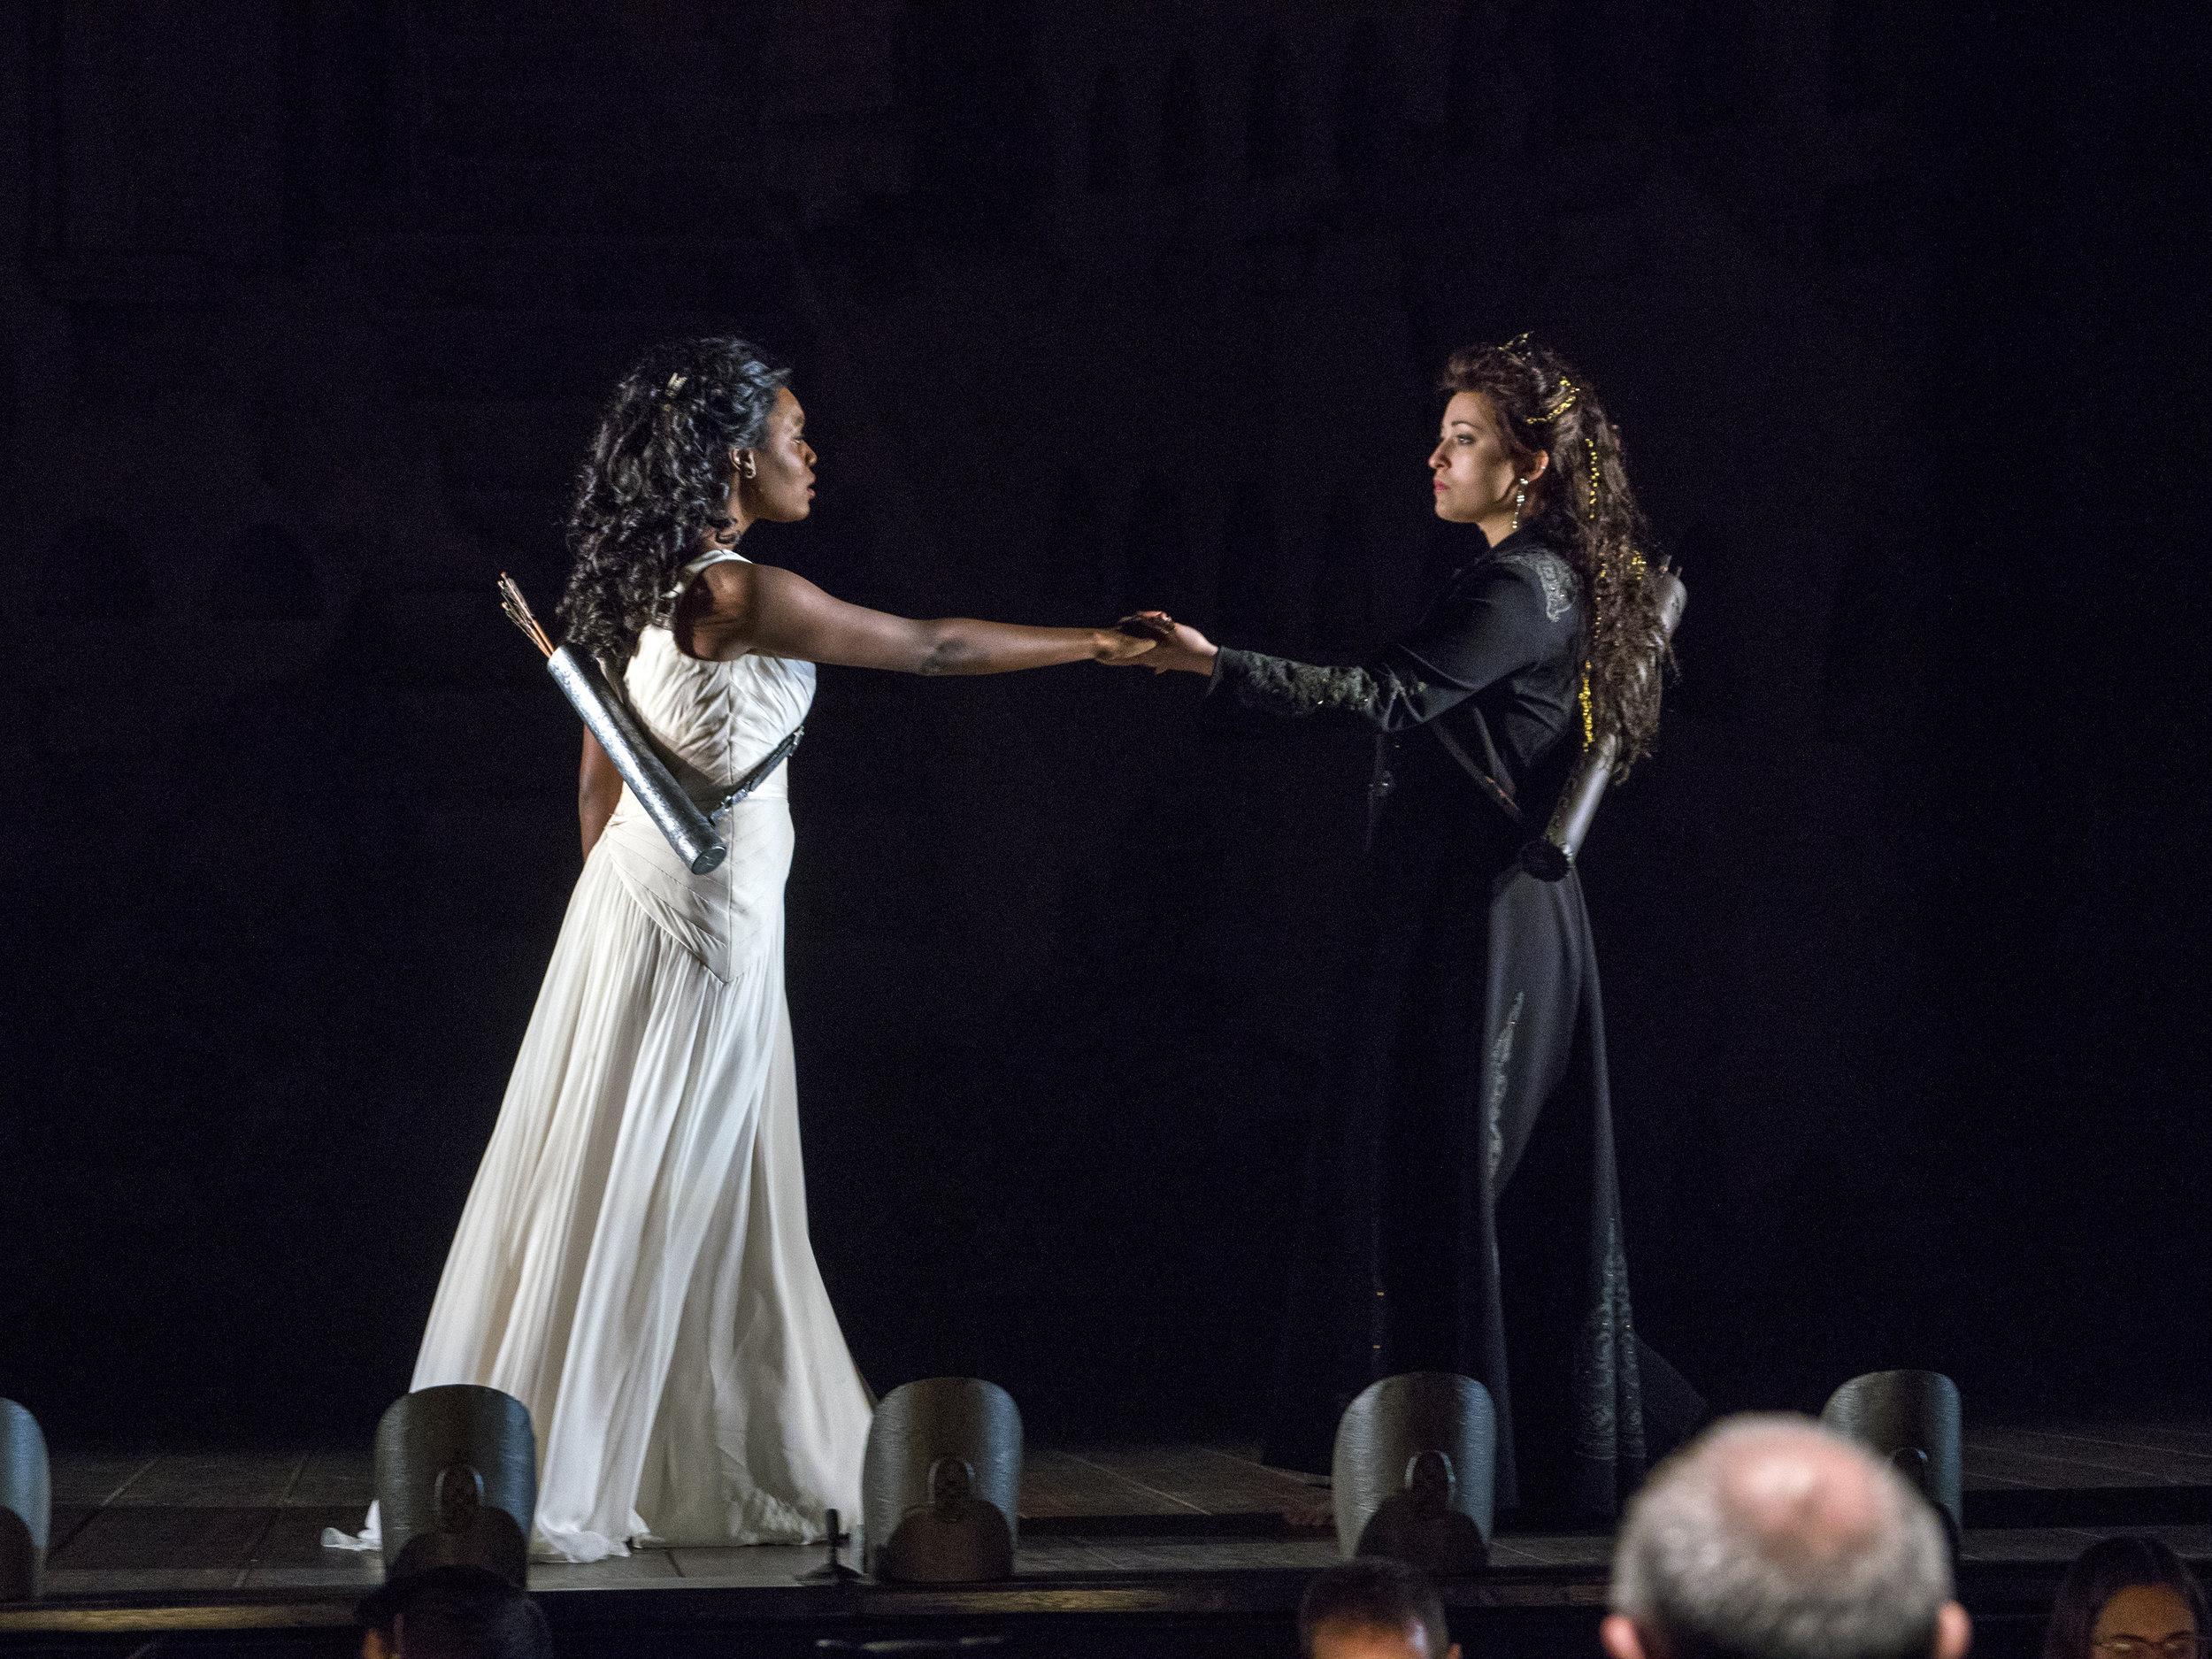 Hippolyte et Aricie - Juilliard Opera (2018)